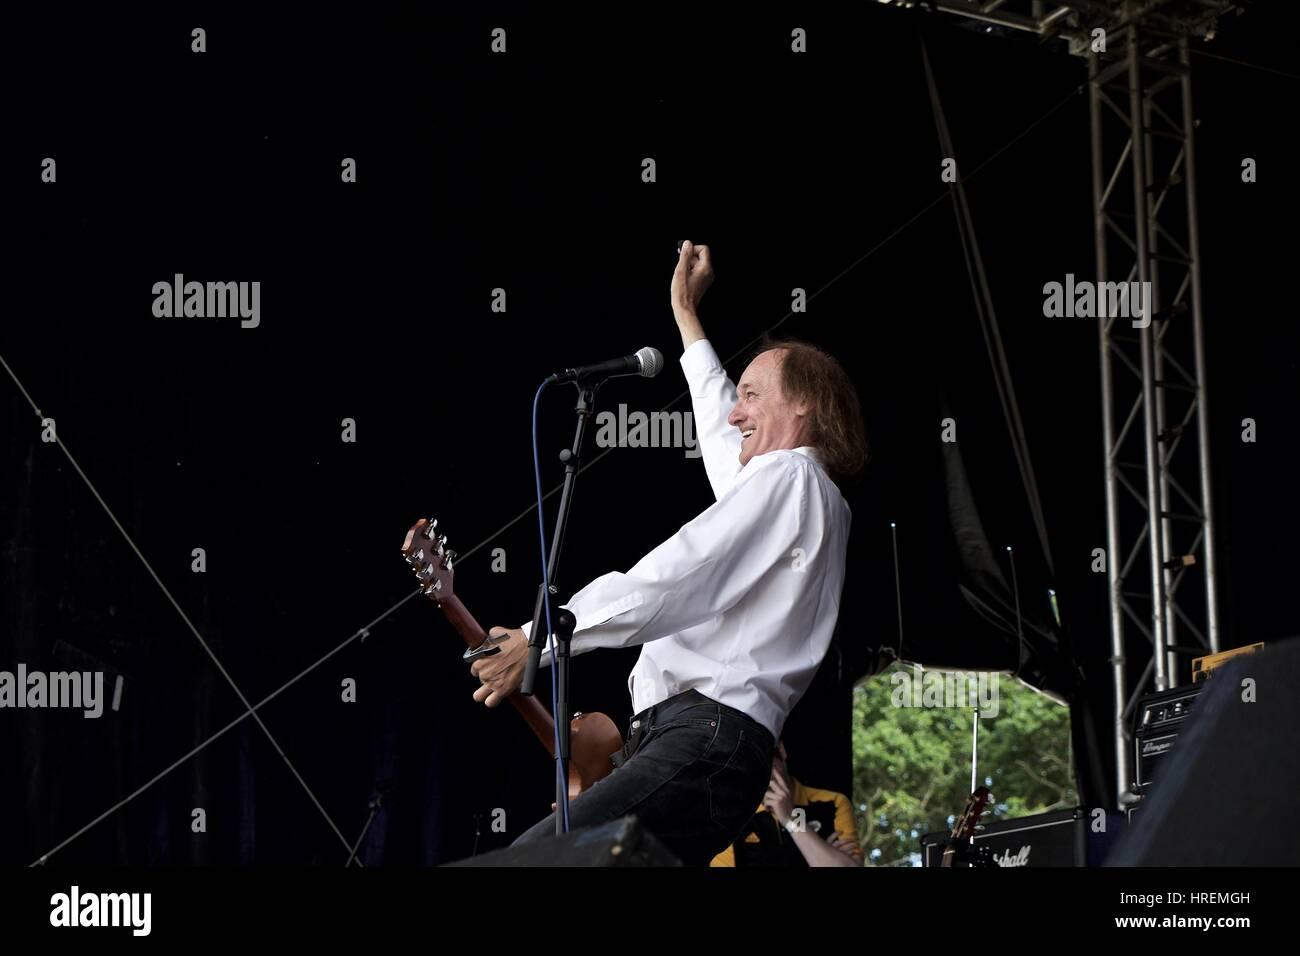 John Otway with a windmill guitar thrash at Rhythmtree 2016 Stock Photo